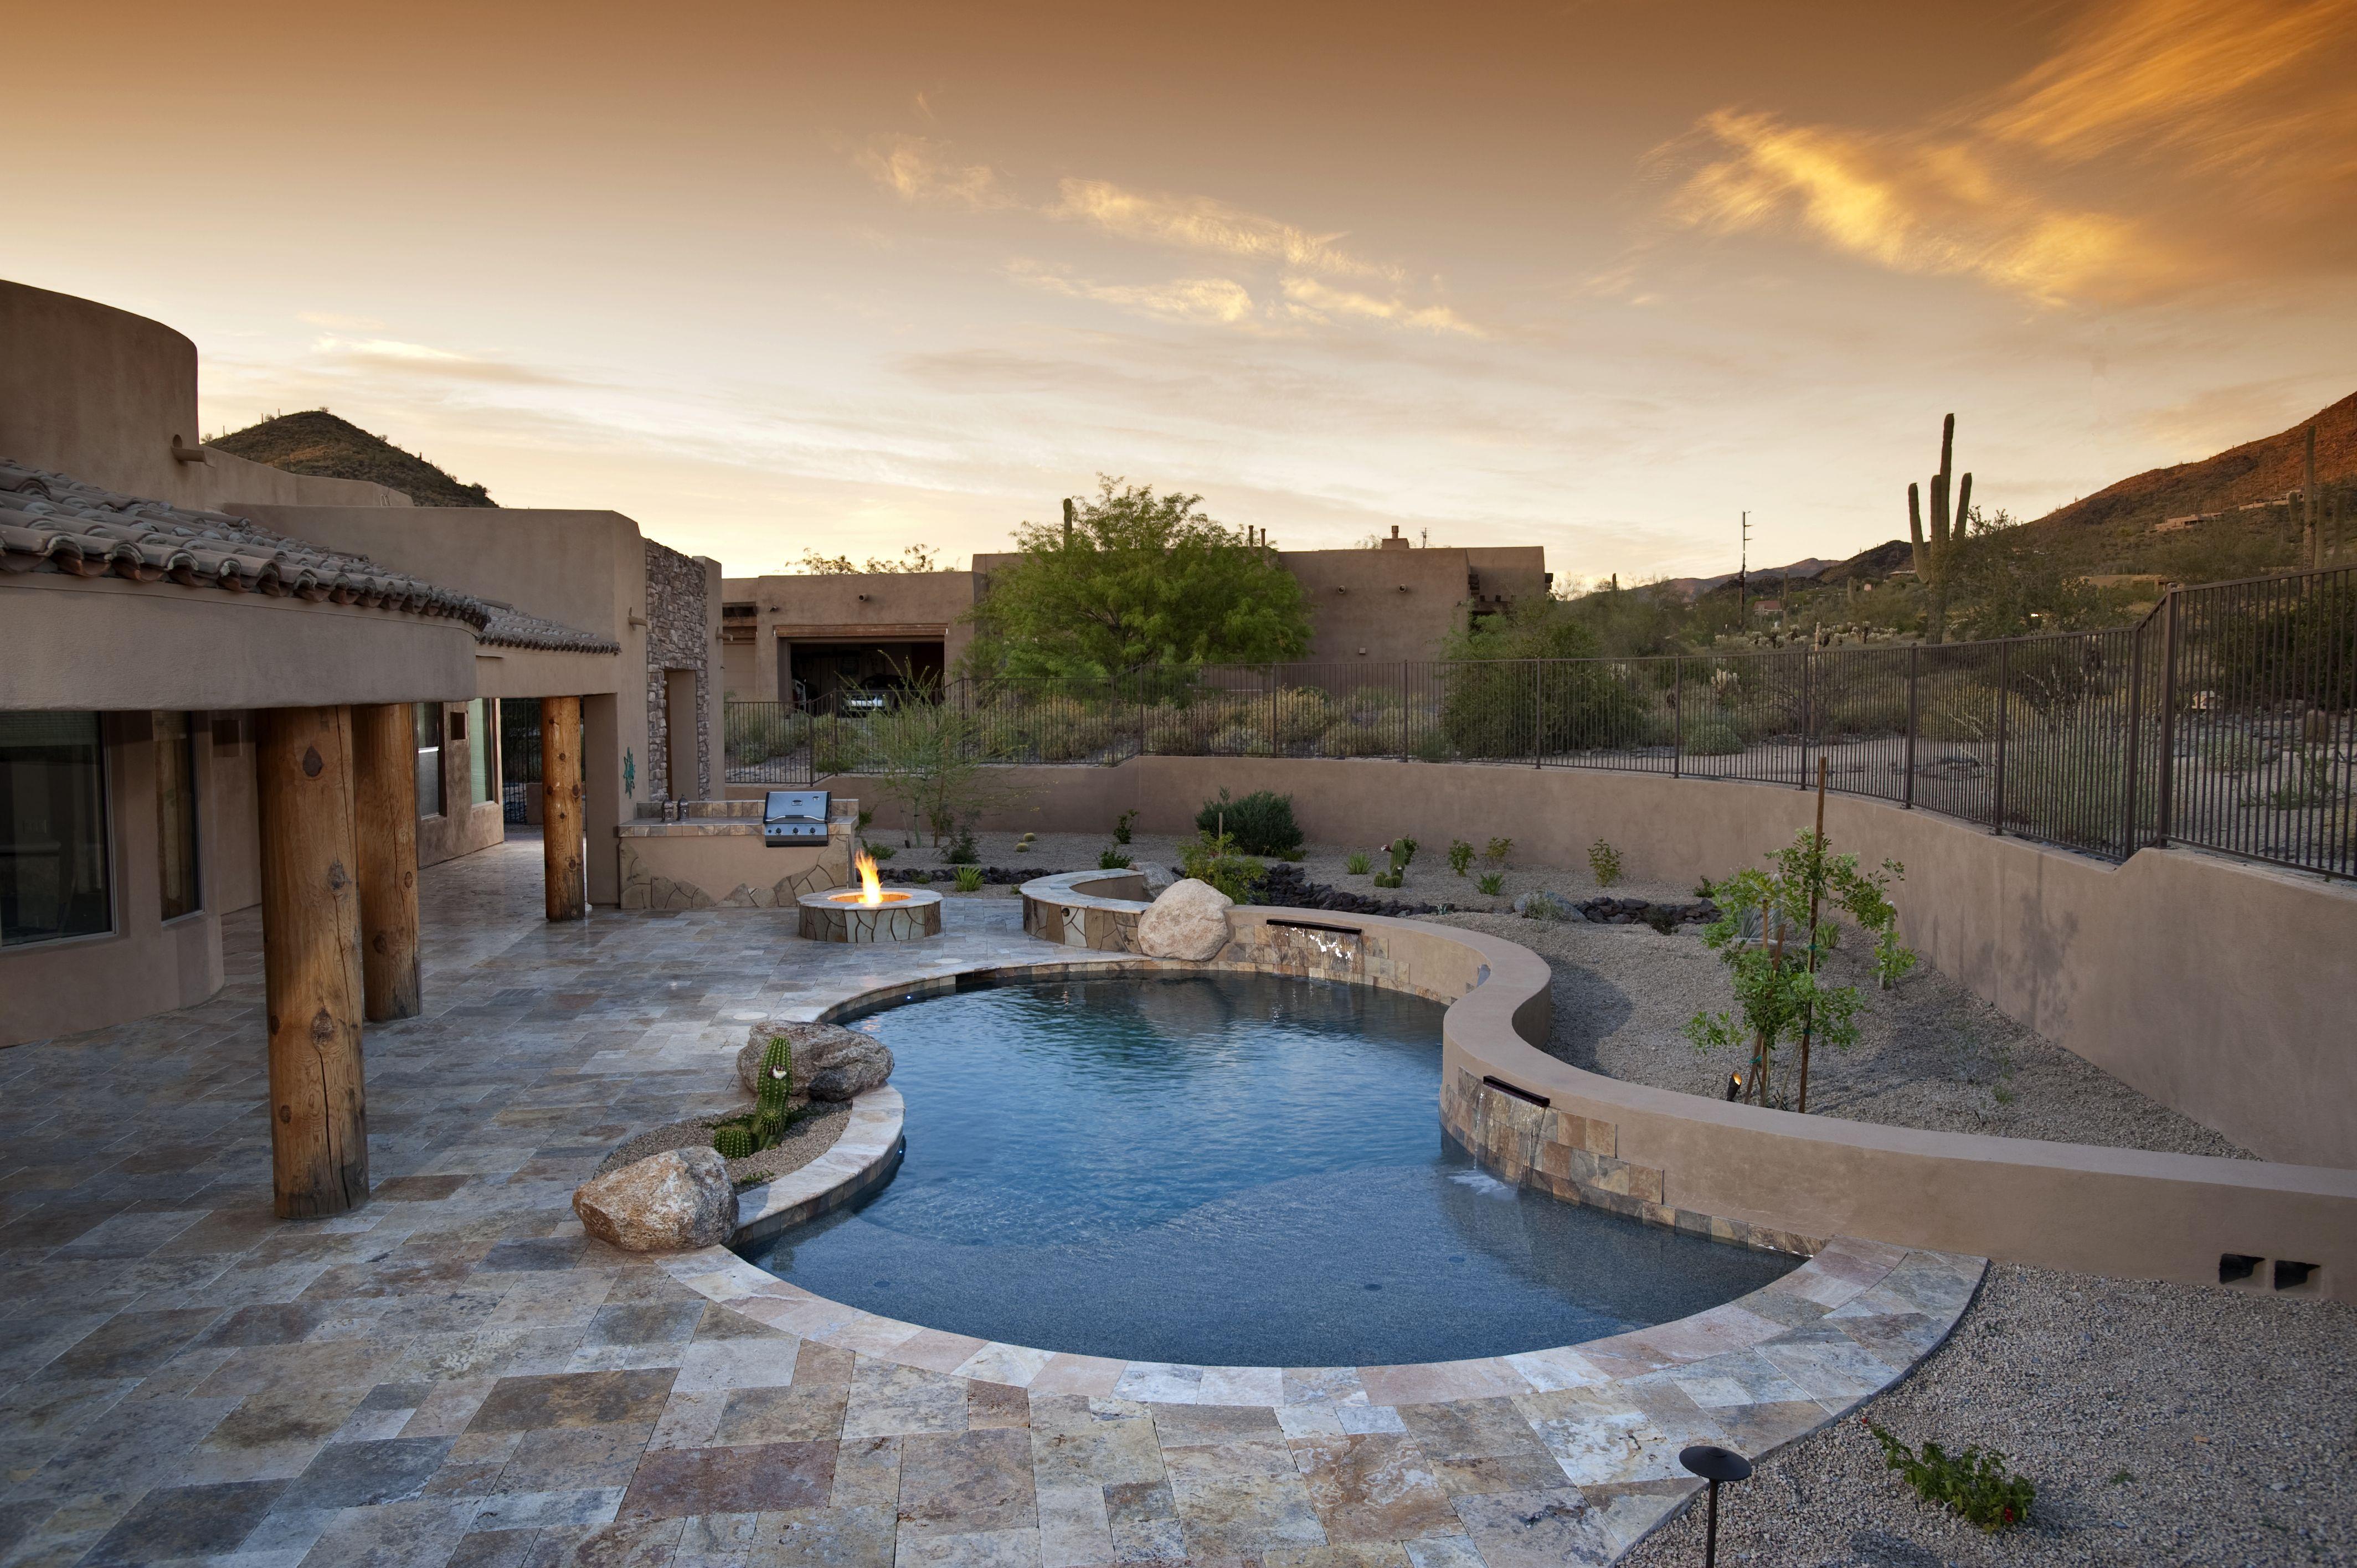 Furniture Stunning Indoor Pool Roof Design On Pool Design Ideas Arizona Backyard Arizona Pools Budget Backyard